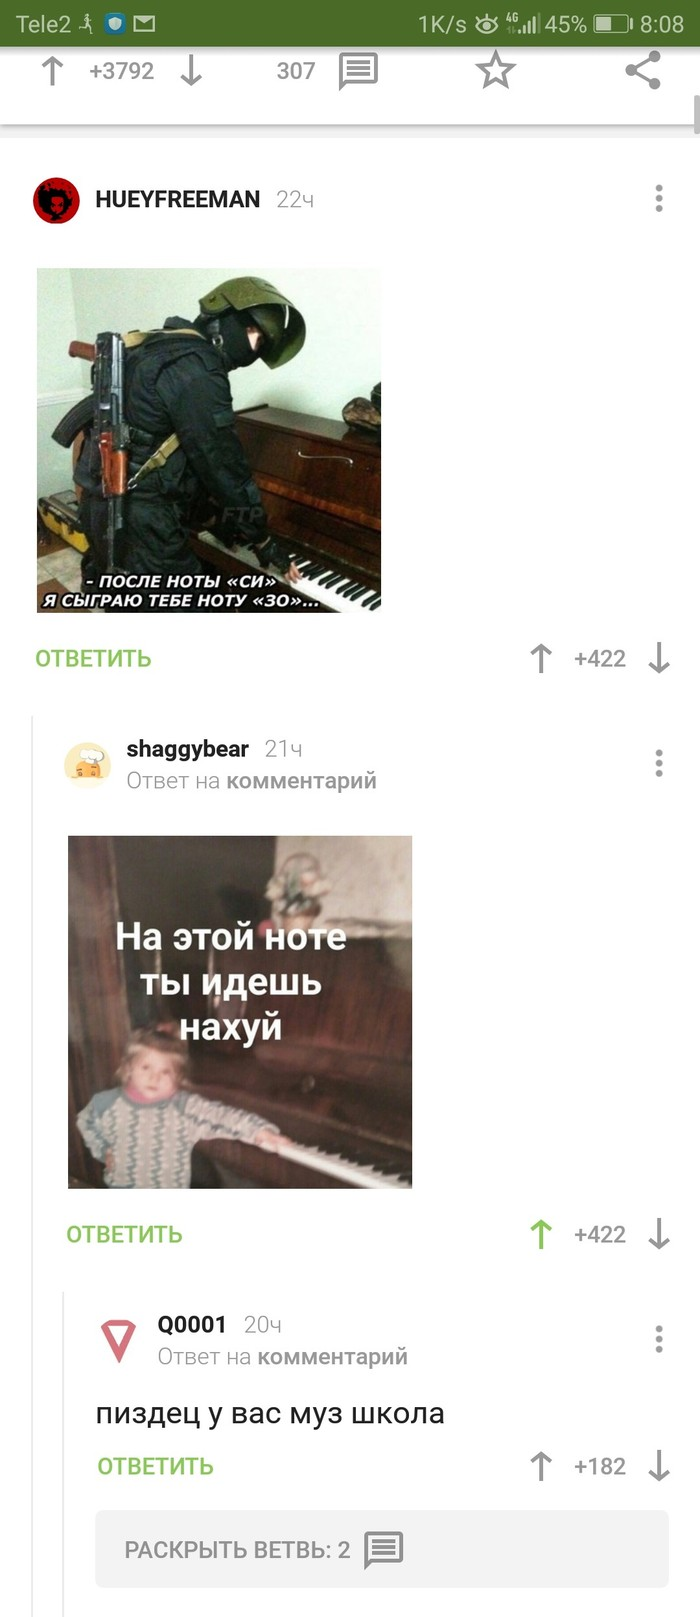 Муз школа Комментарии, СИЗО, Длиннопост